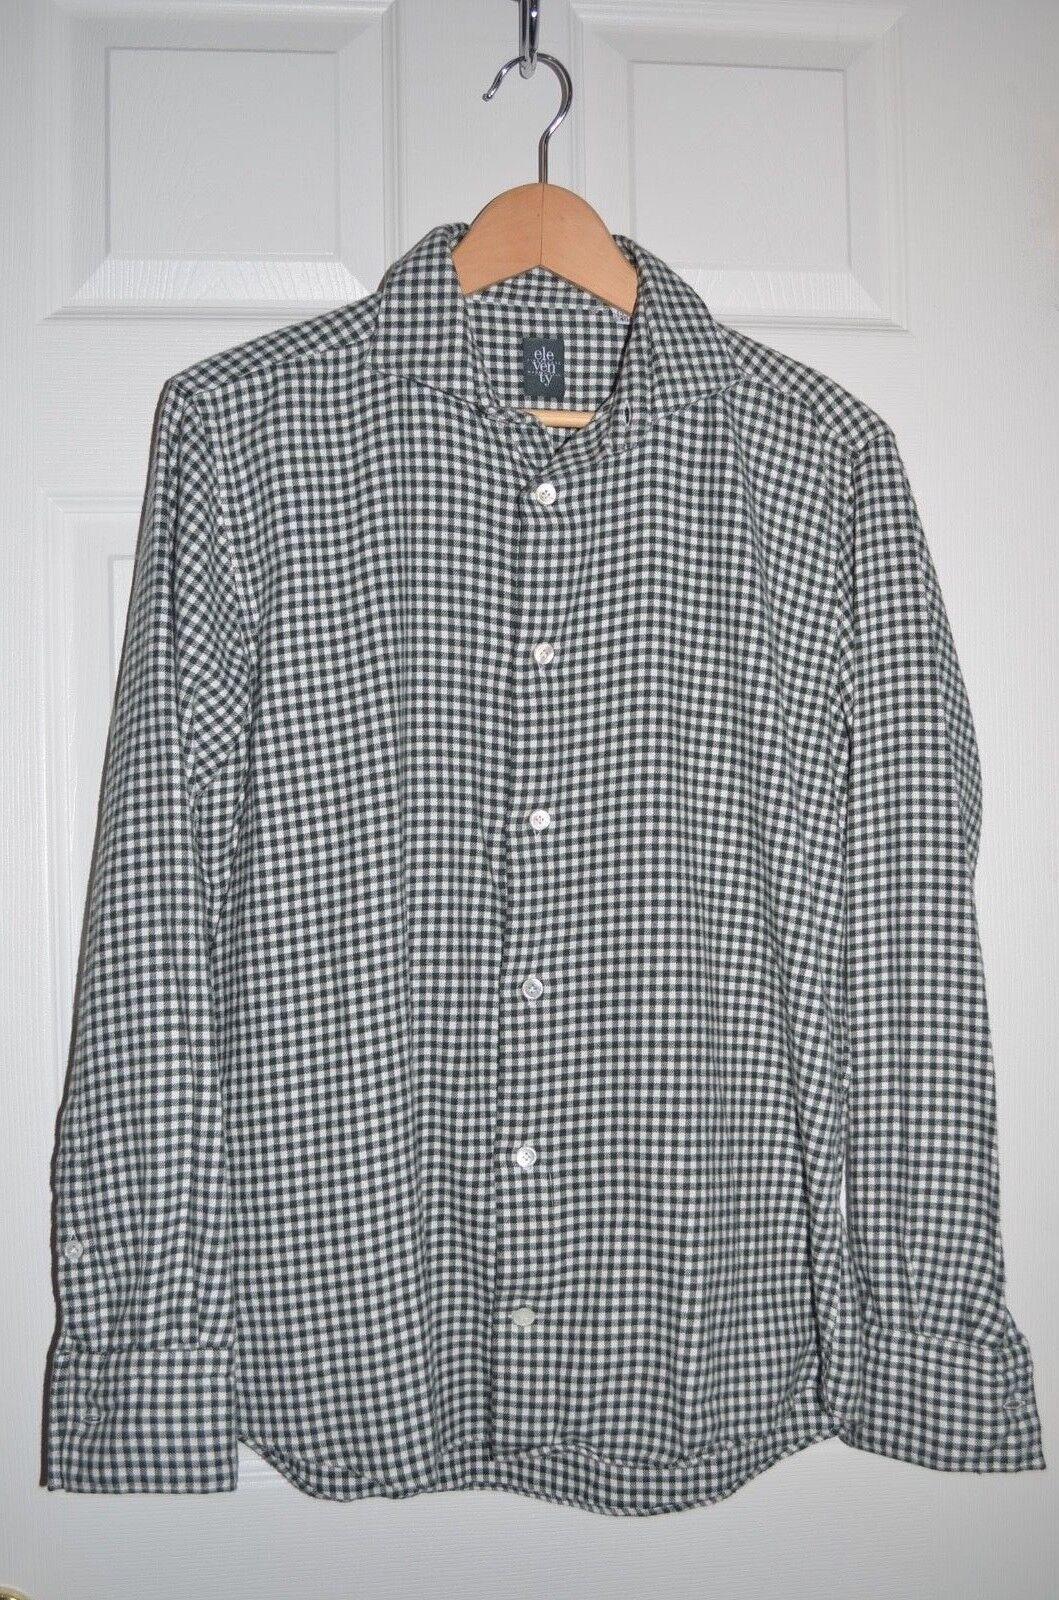 NEW ELEVENTY FIRST CLASS ITALY Flannel Plaid Grn CASUAL DRESS SHIRT SZ 15.75 40